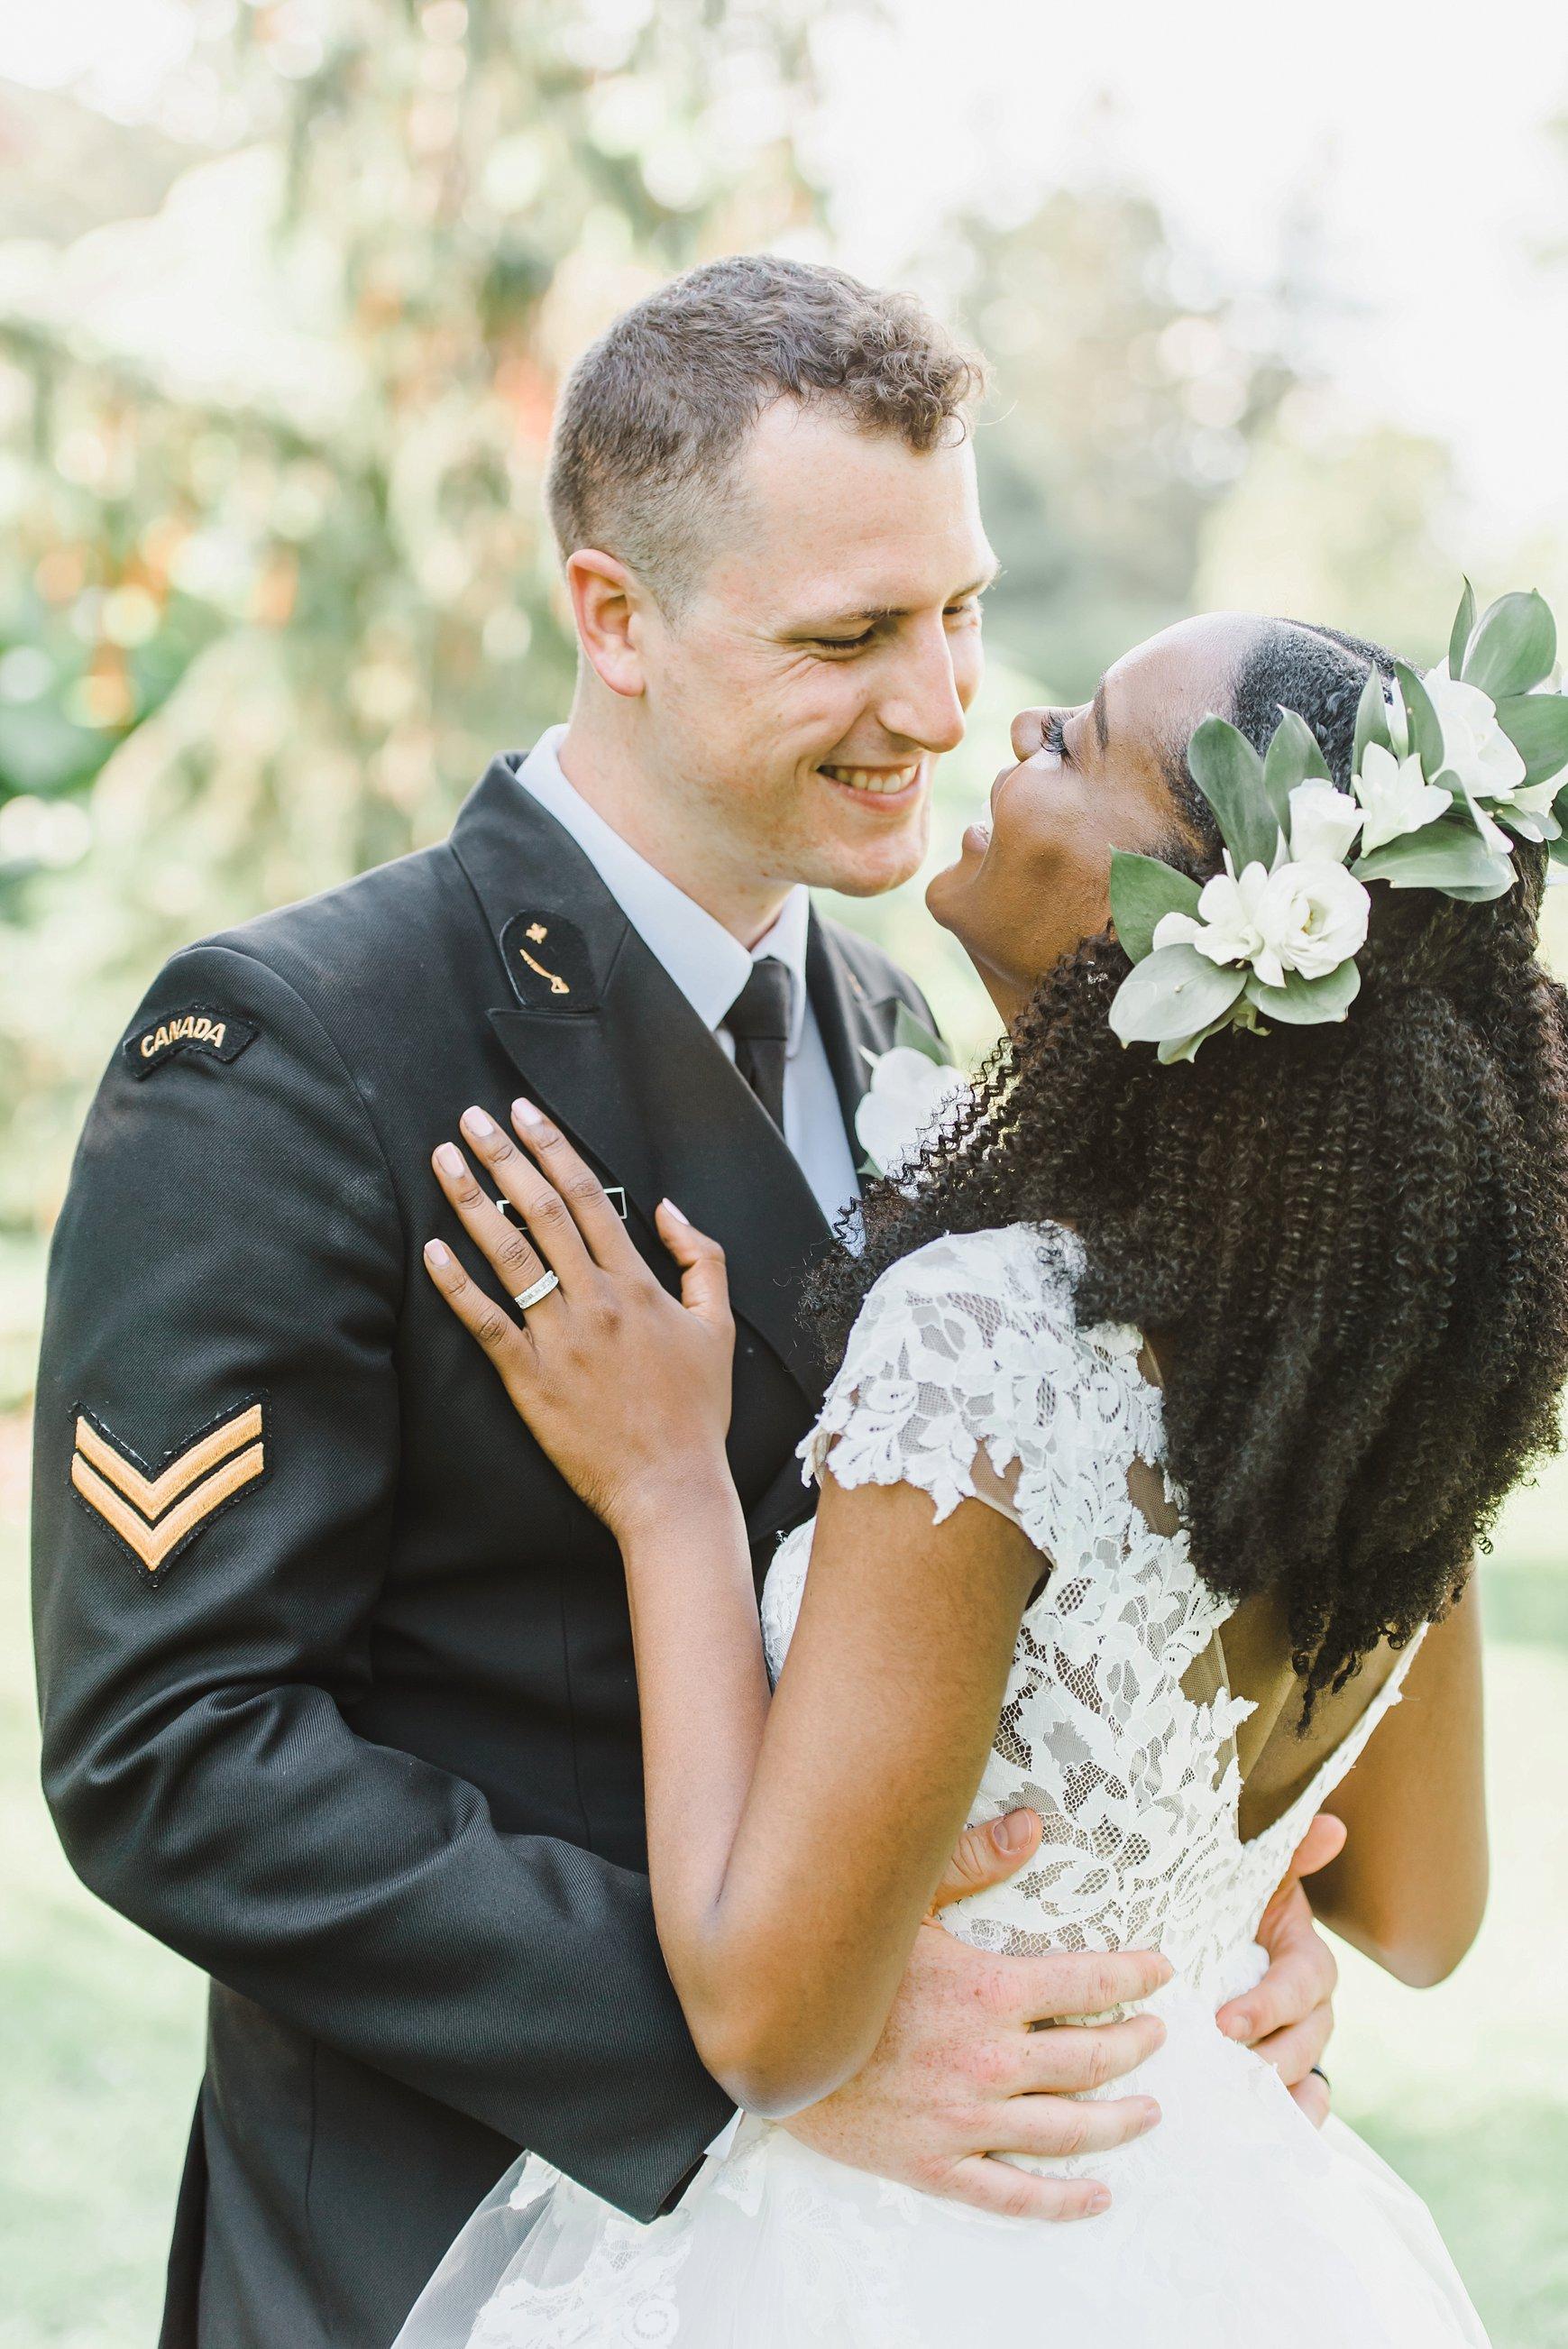 light airy indie fine art ottawa wedding photographer | Ali and Batoul Photography_1011.jpg